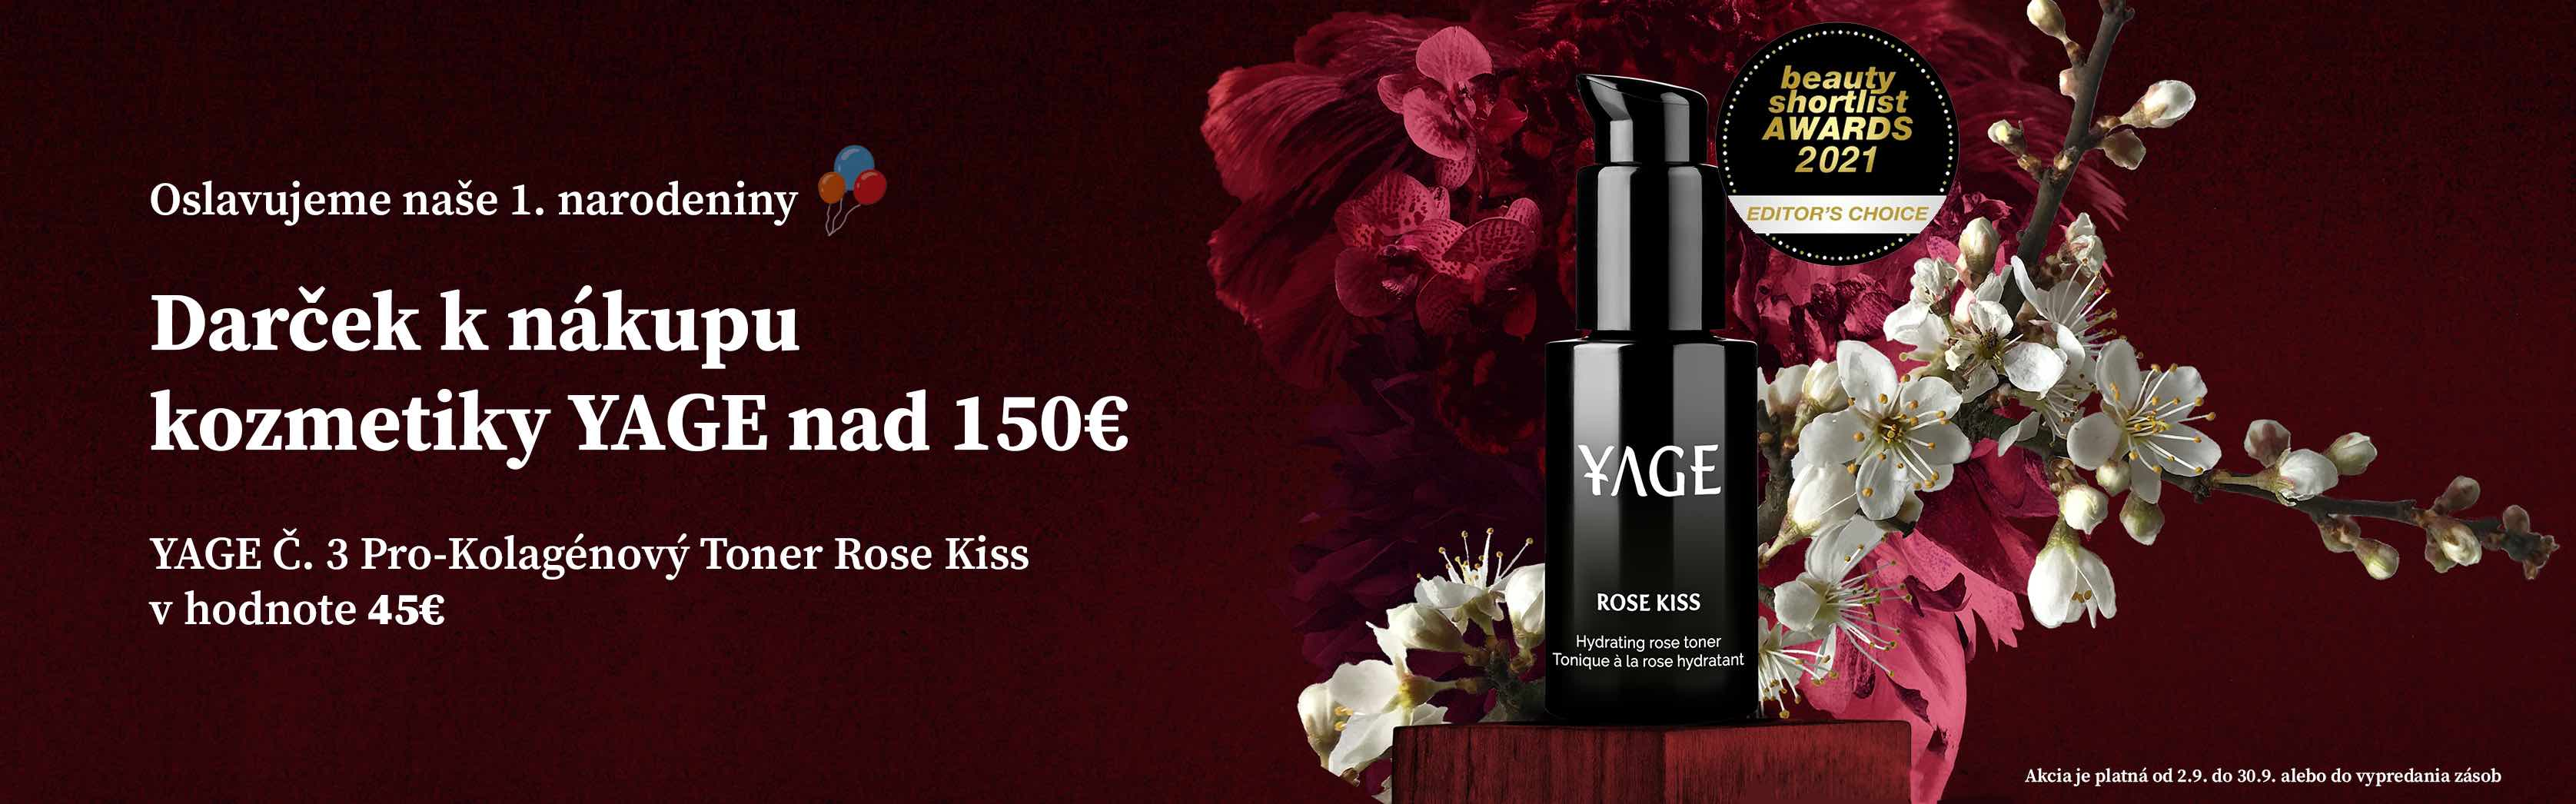 Darček YAGE Toner Rose Kiss v hodnote 45€ k nákupu kozmetiky YAGE nad 150€